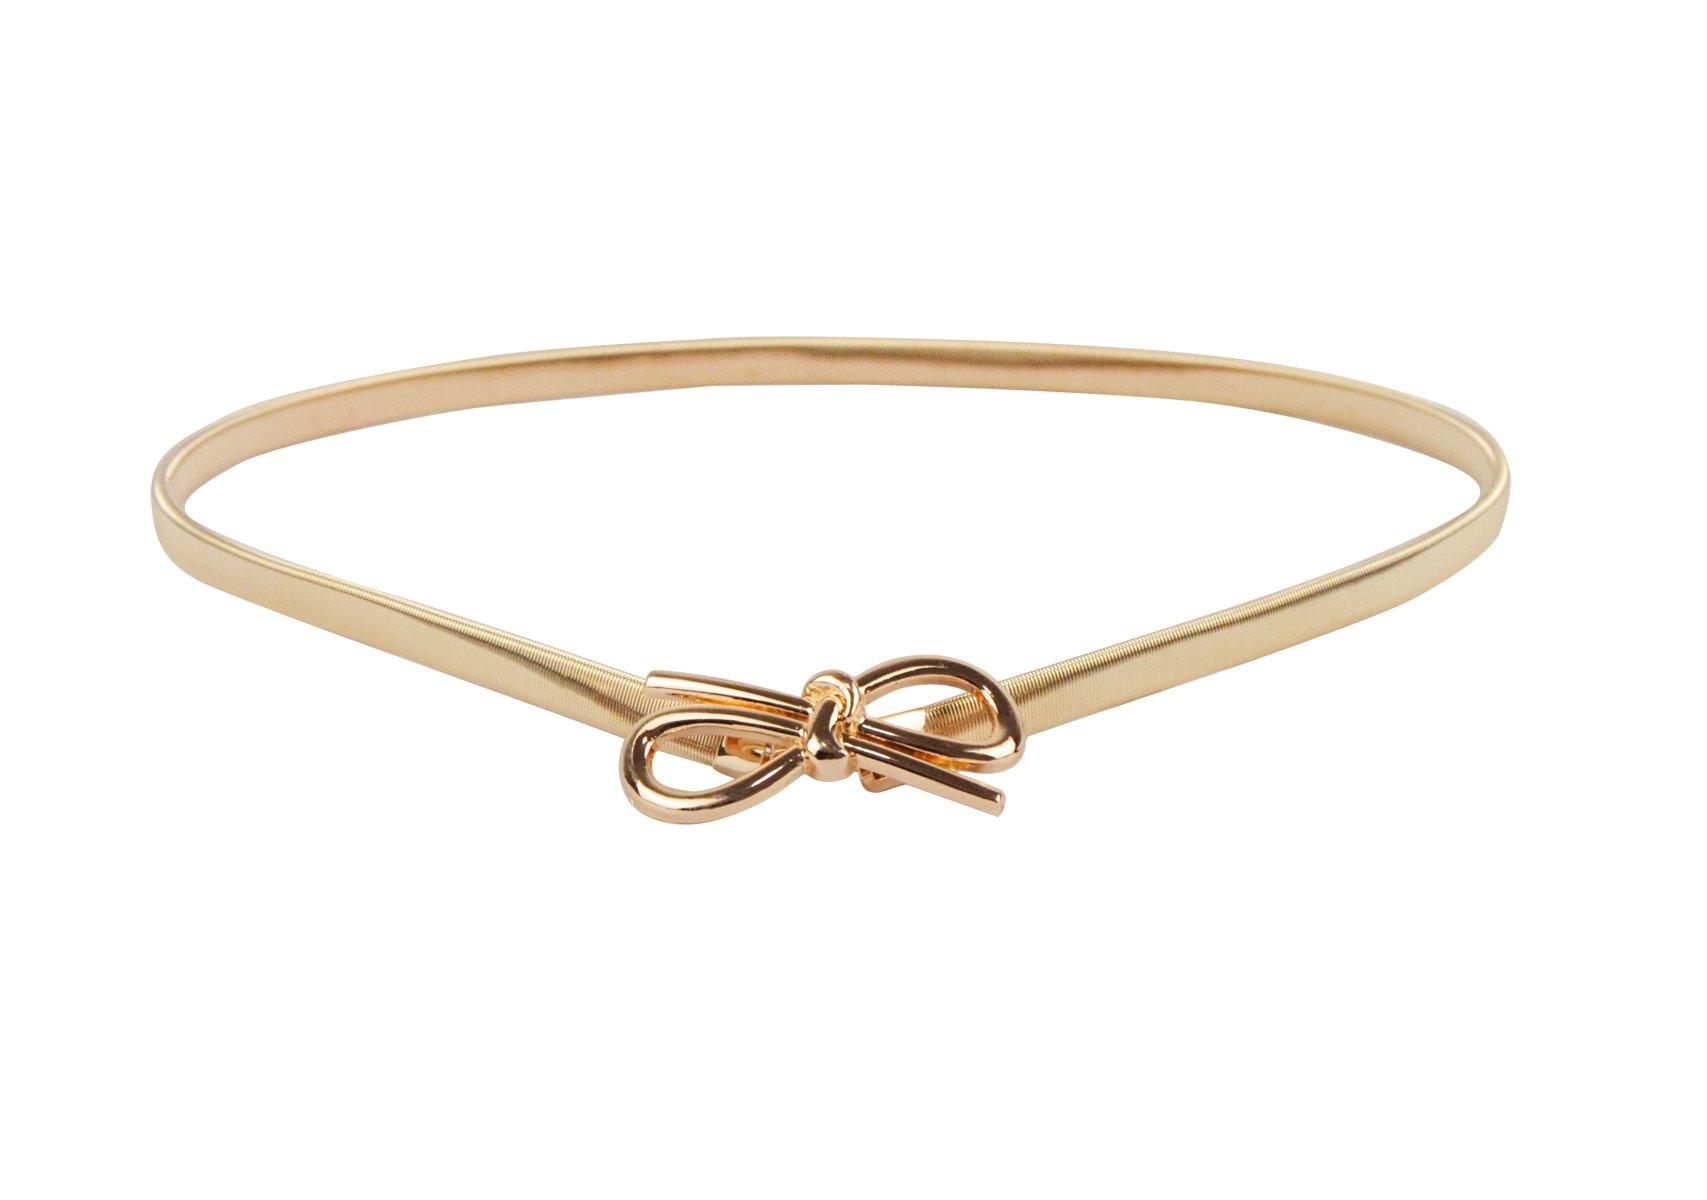 E-Clover Cute Bowknot Metal Buckle Skinny Stretch Waist Belt For Dress (Style2)